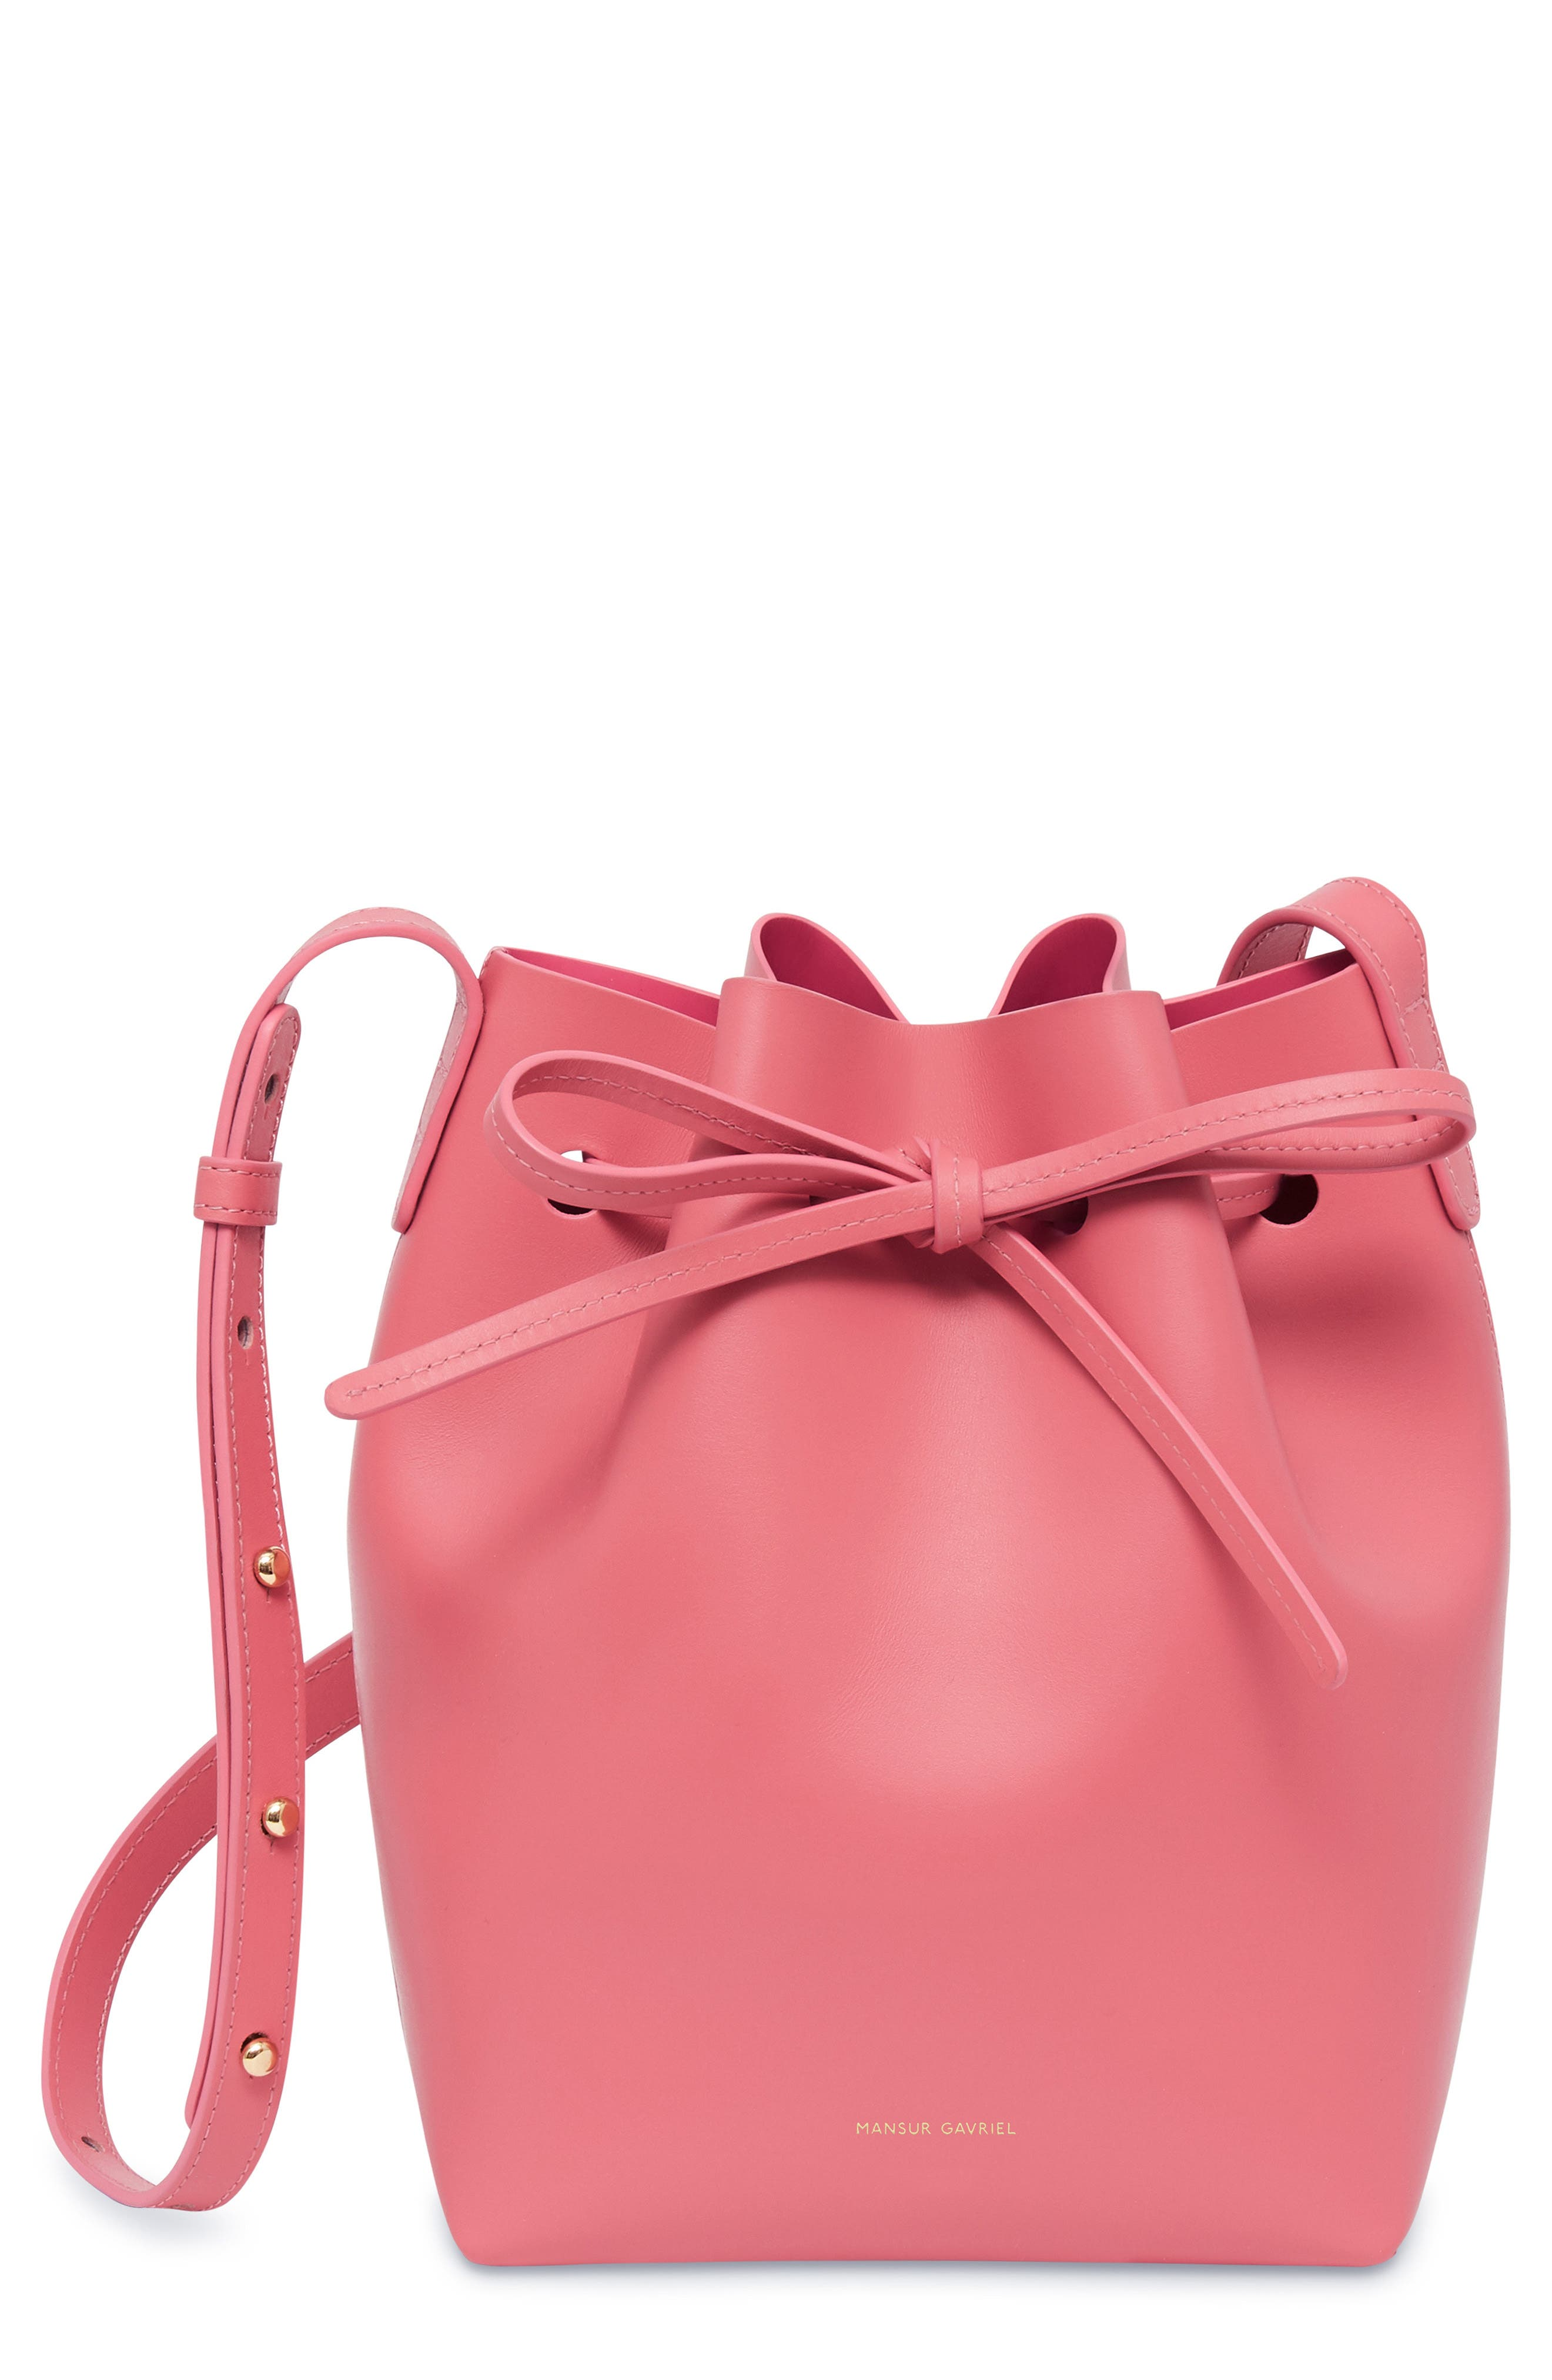 Mini Leather Bucket Bag, Main, color, DOLLY